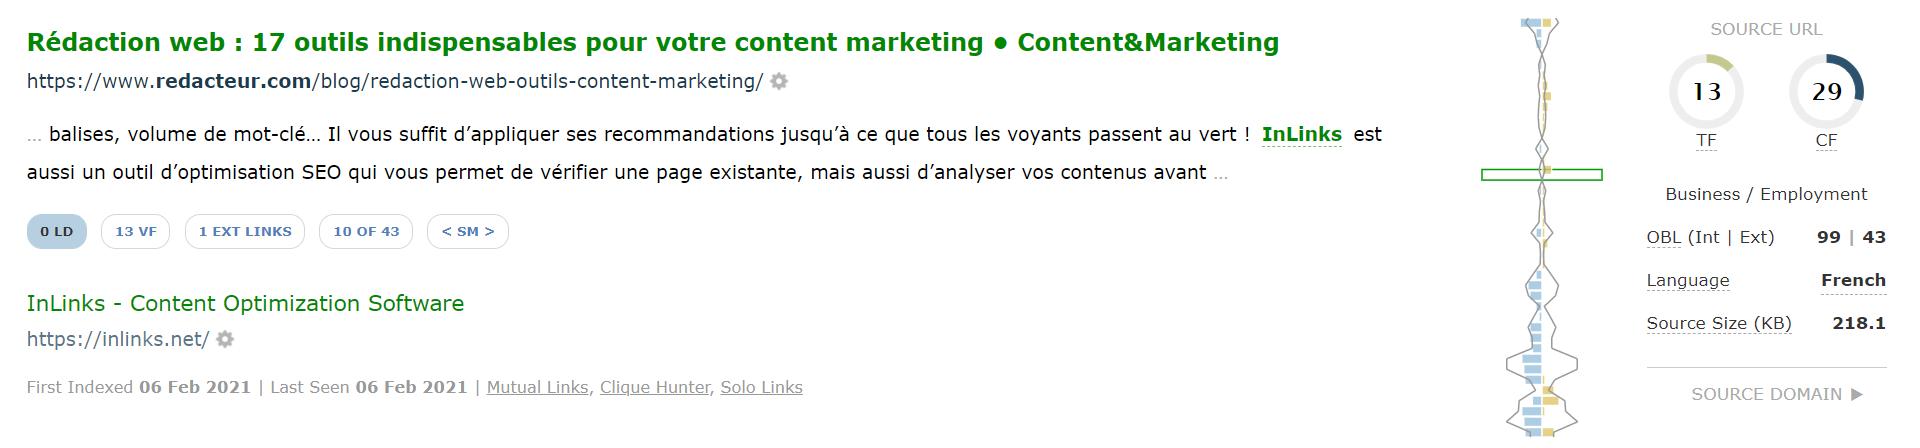 Link context for redacteur.com